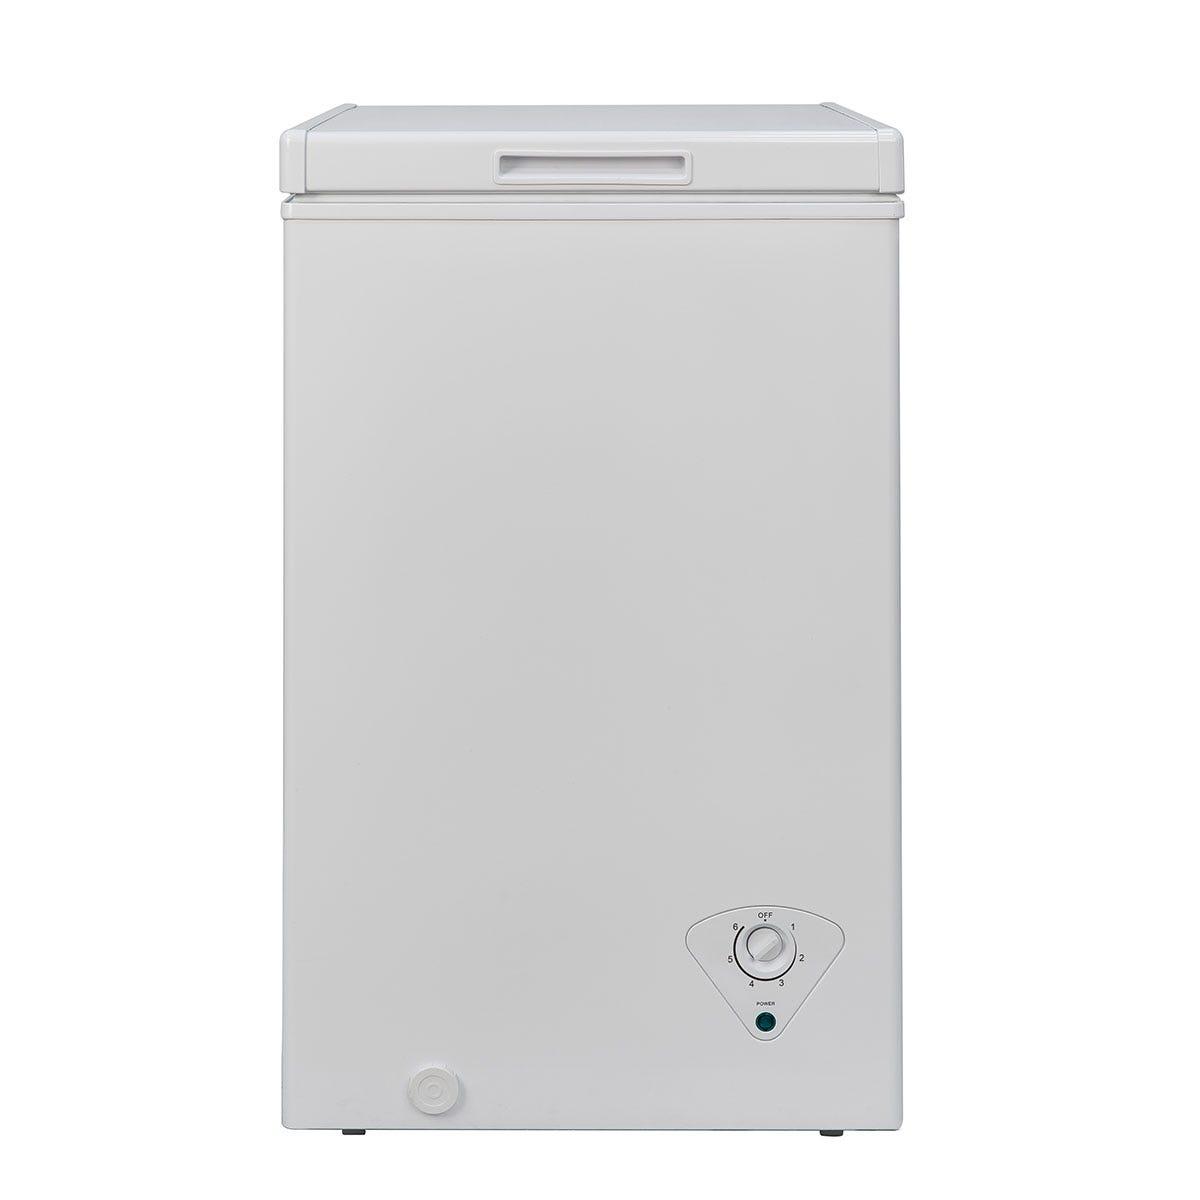 Russell Hobbs RHCF60 60L Chest Freezer - White